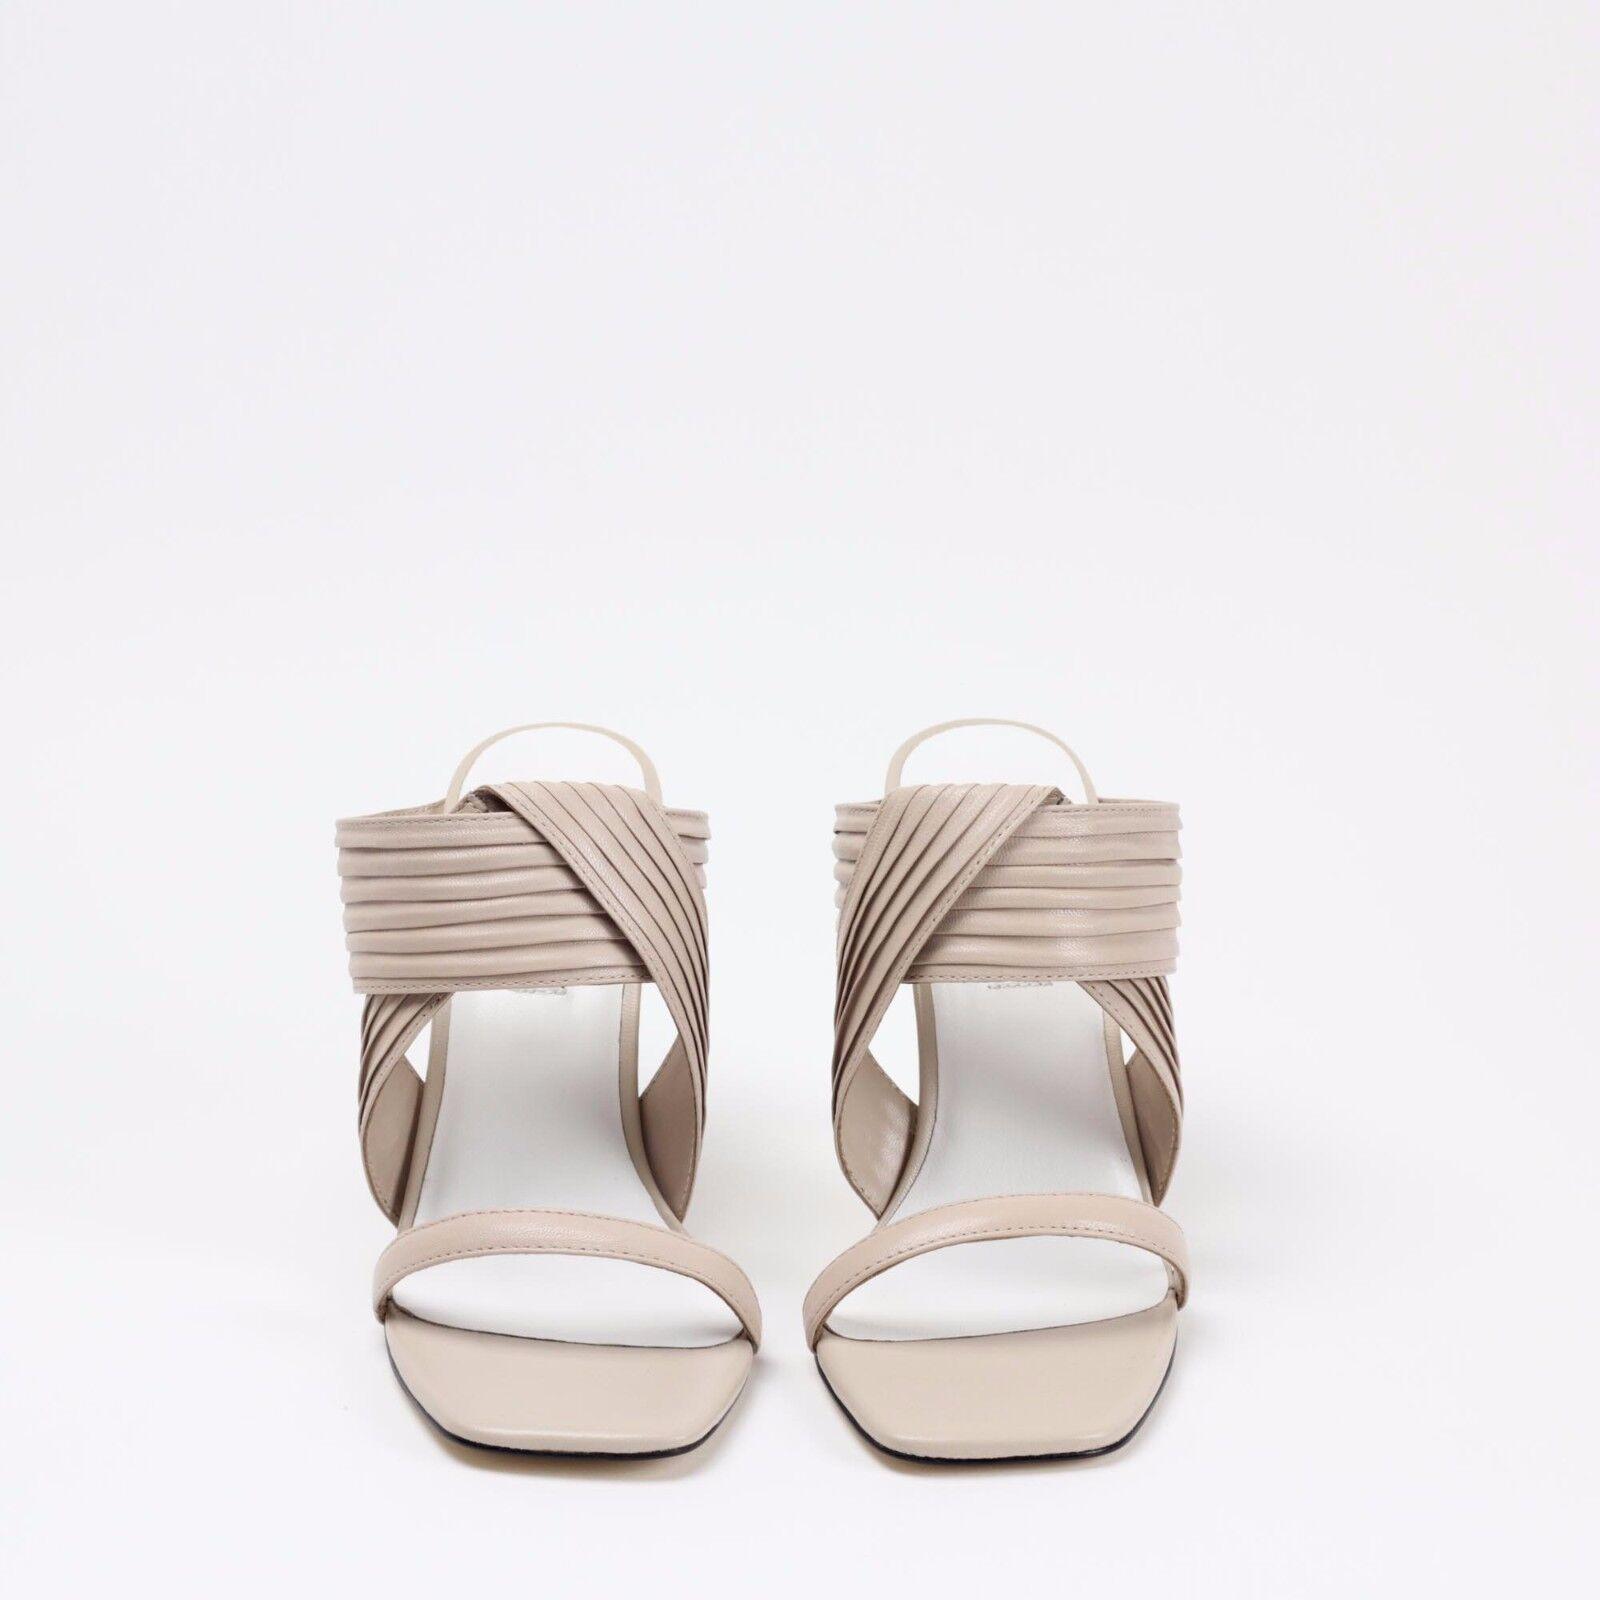 Senso Sera II Nude Beige Matt Kid Leder Schuhe High Mule Sandale Summer Schuhe Leder 02deea